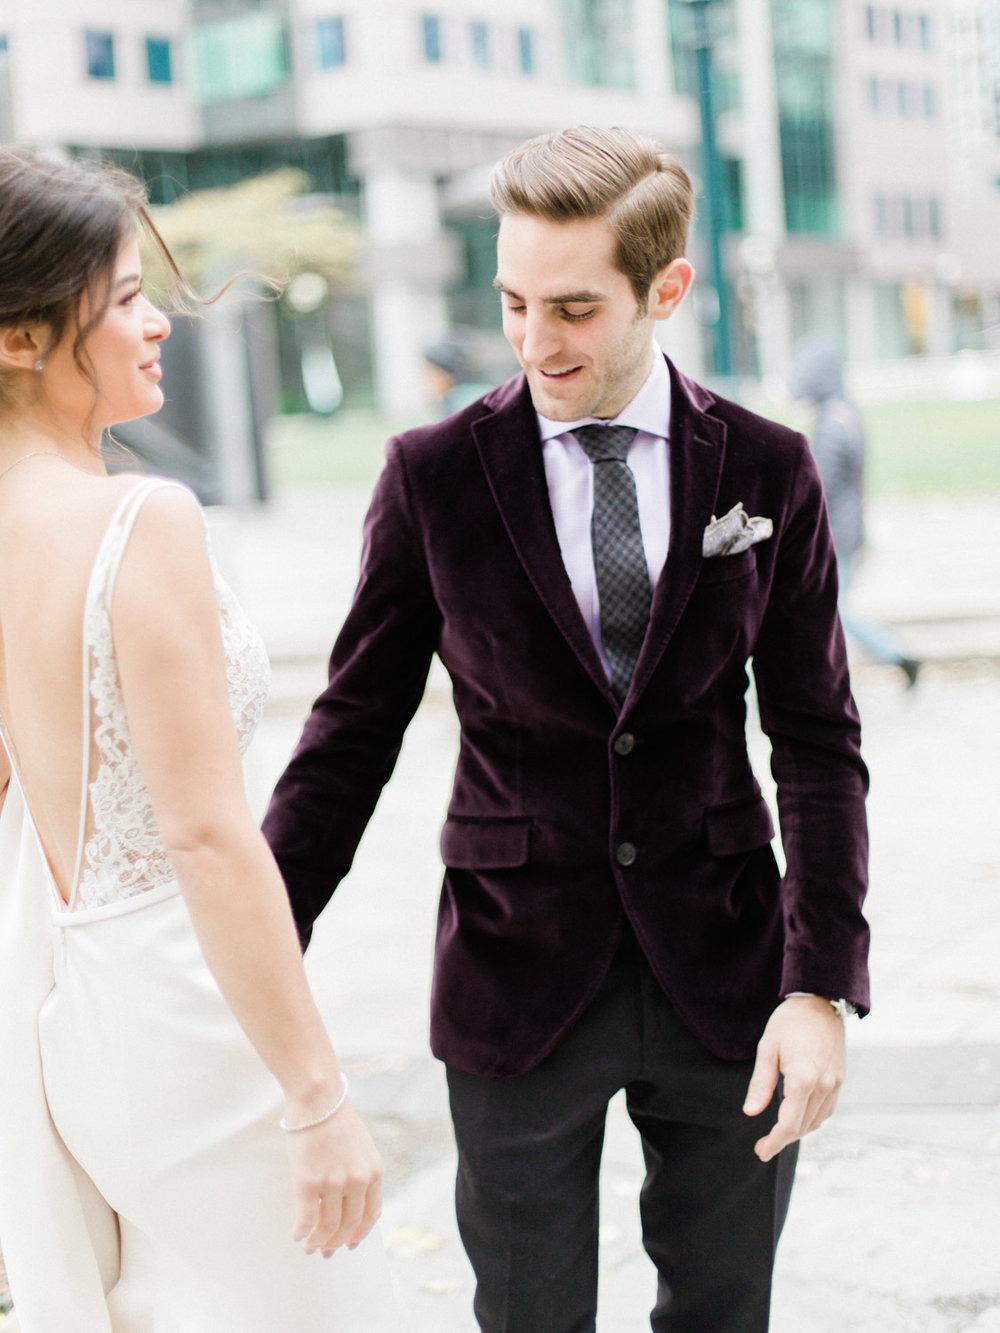 Toronto-wedding-photographer-intimate-italian-the-burroughes-downtown30.jpg